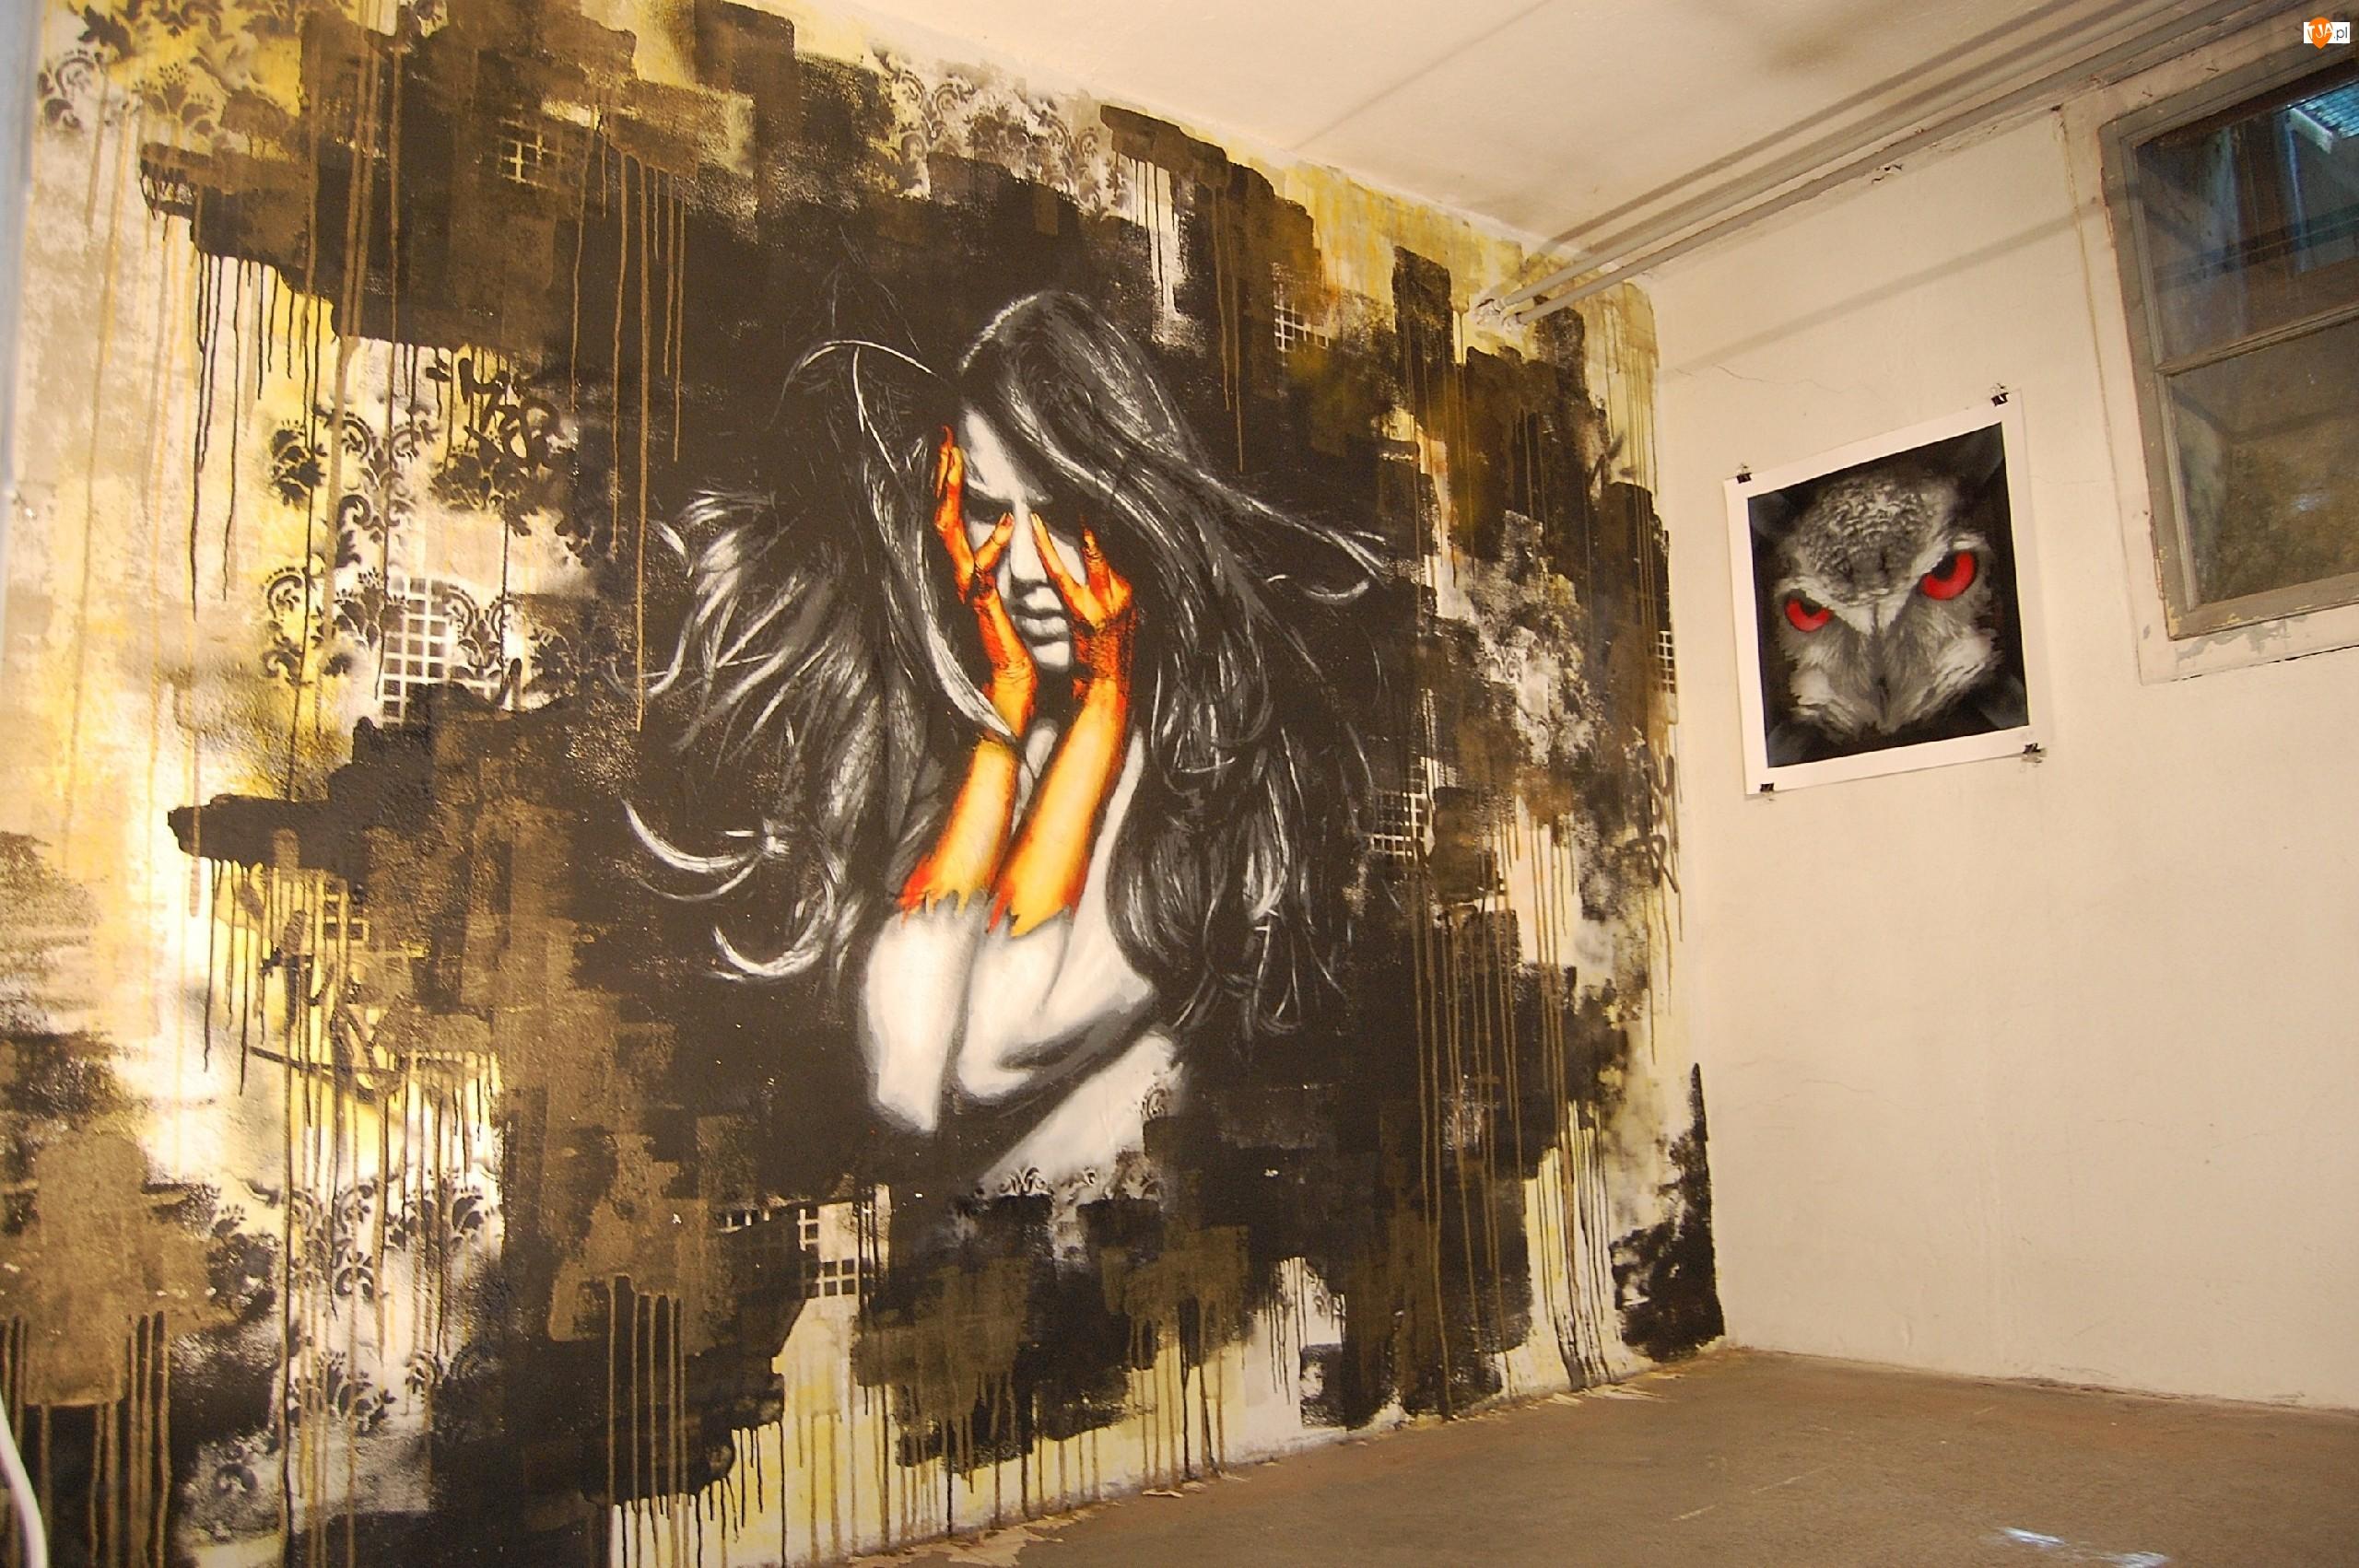 Mural, Kobieta, Street art